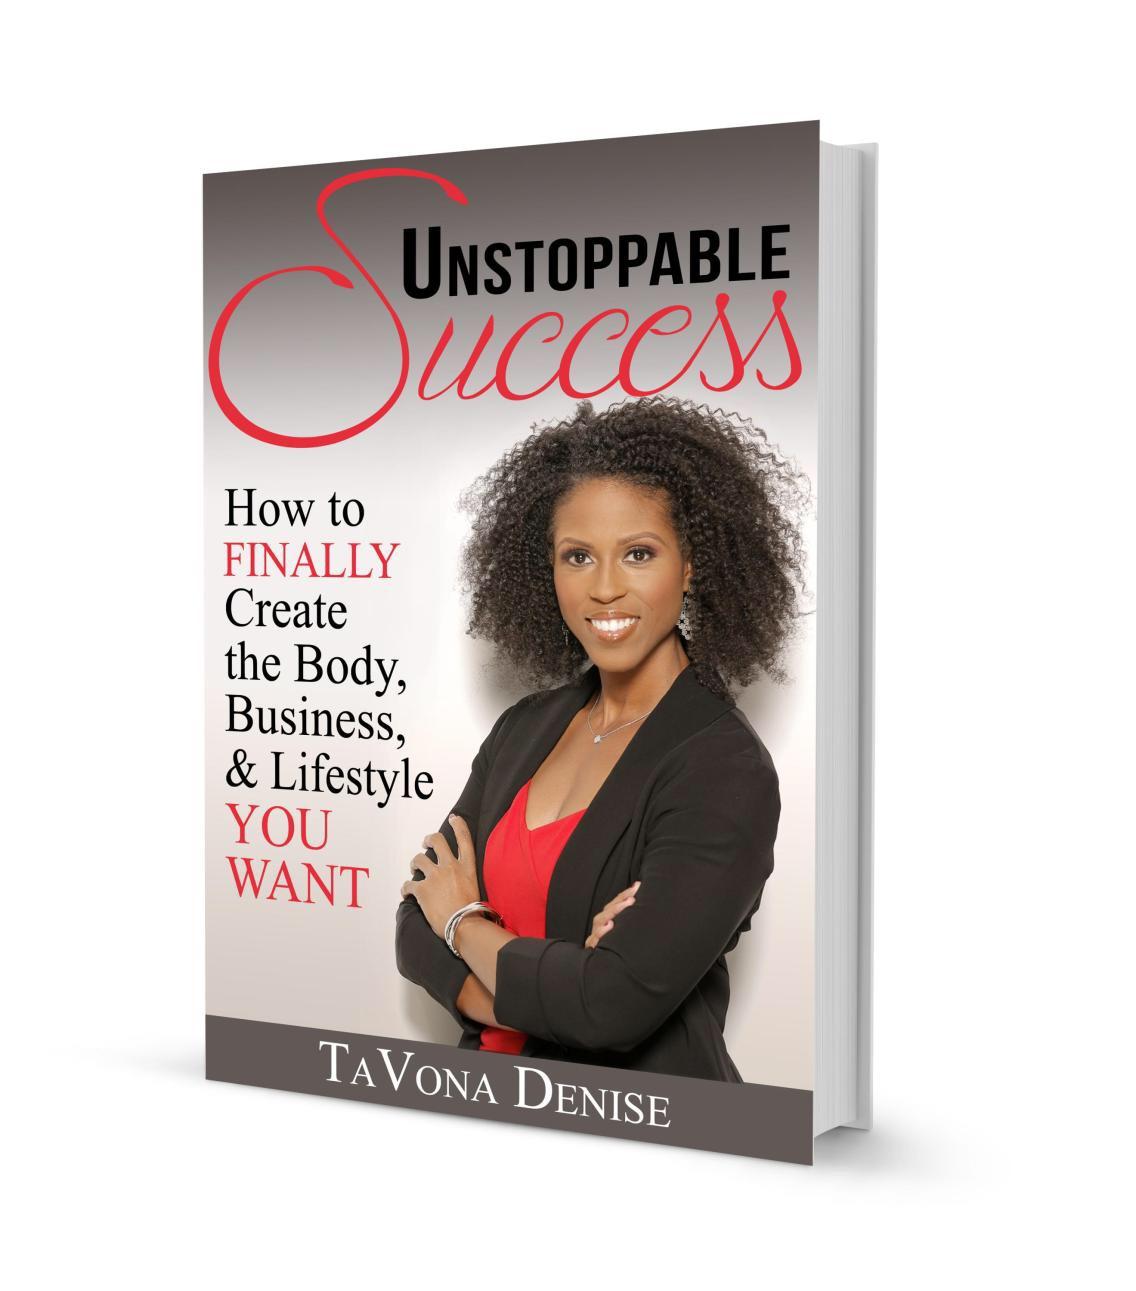 Workbooks success principles workbook : Unstoppable Success Book - TaVona Denise